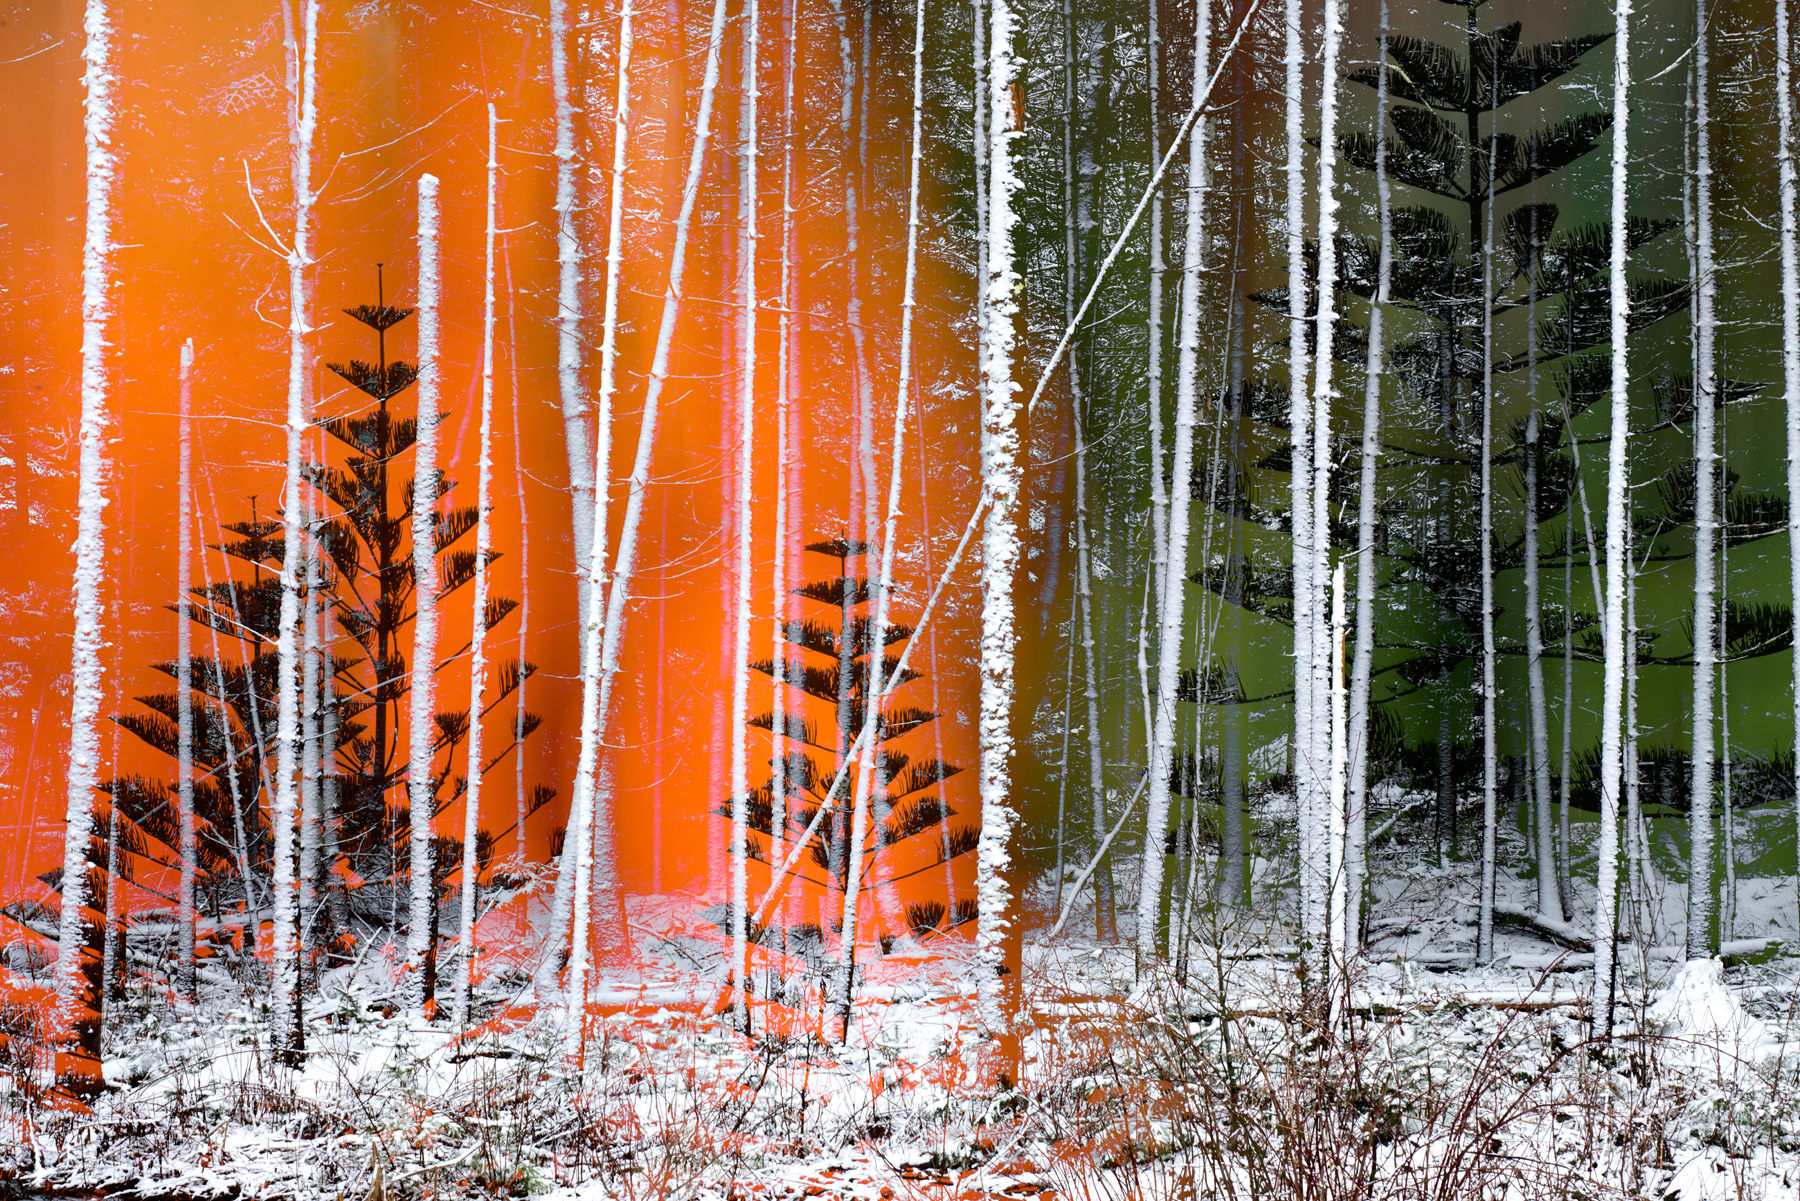 ORANGE+SNOW+TREES+ORANGE_1.jpg